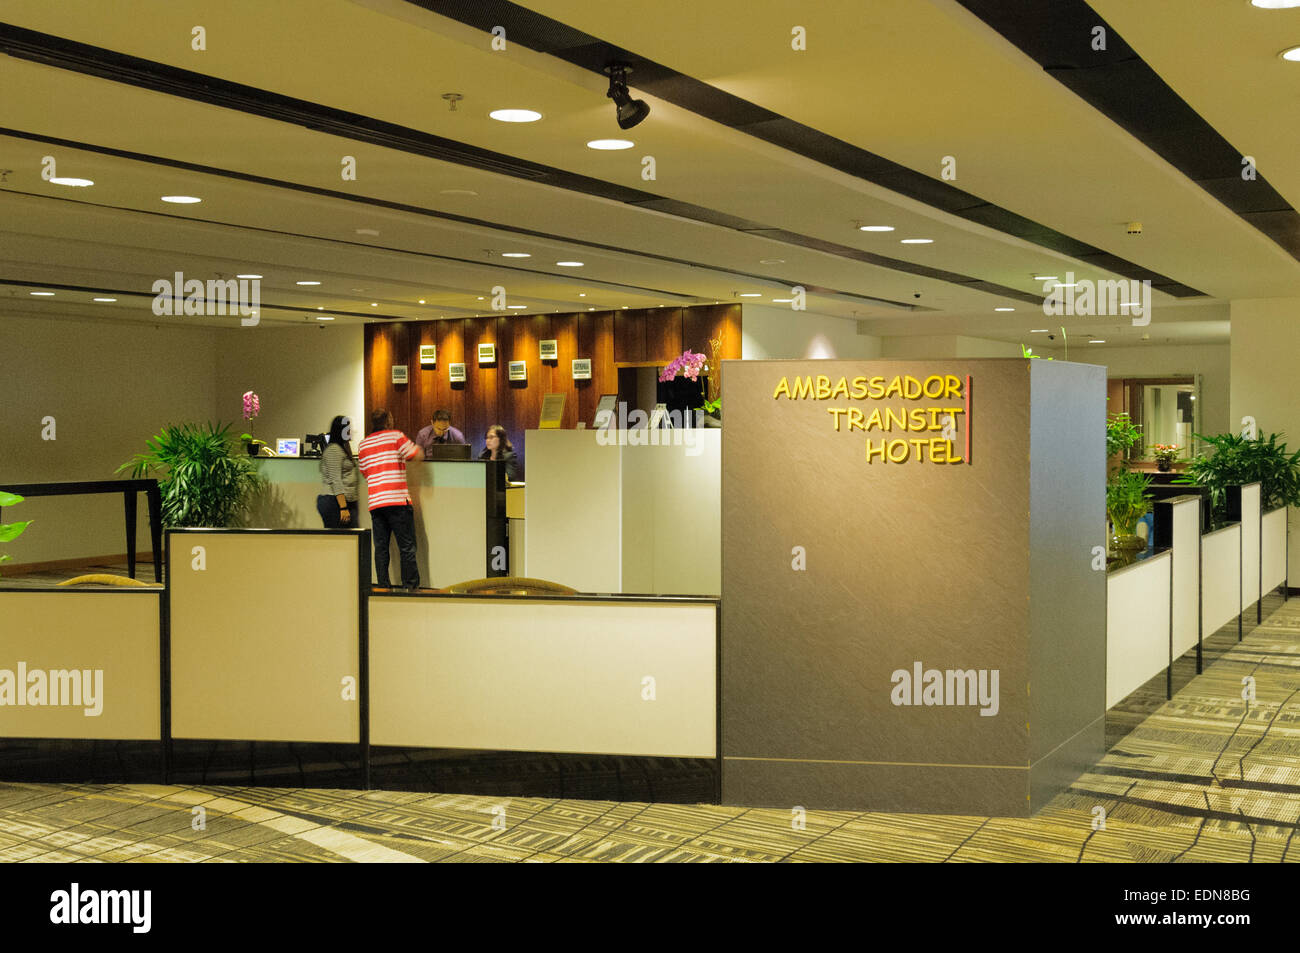 Singapore Changi international airport Ambassador Transit Hotel - Stock Image